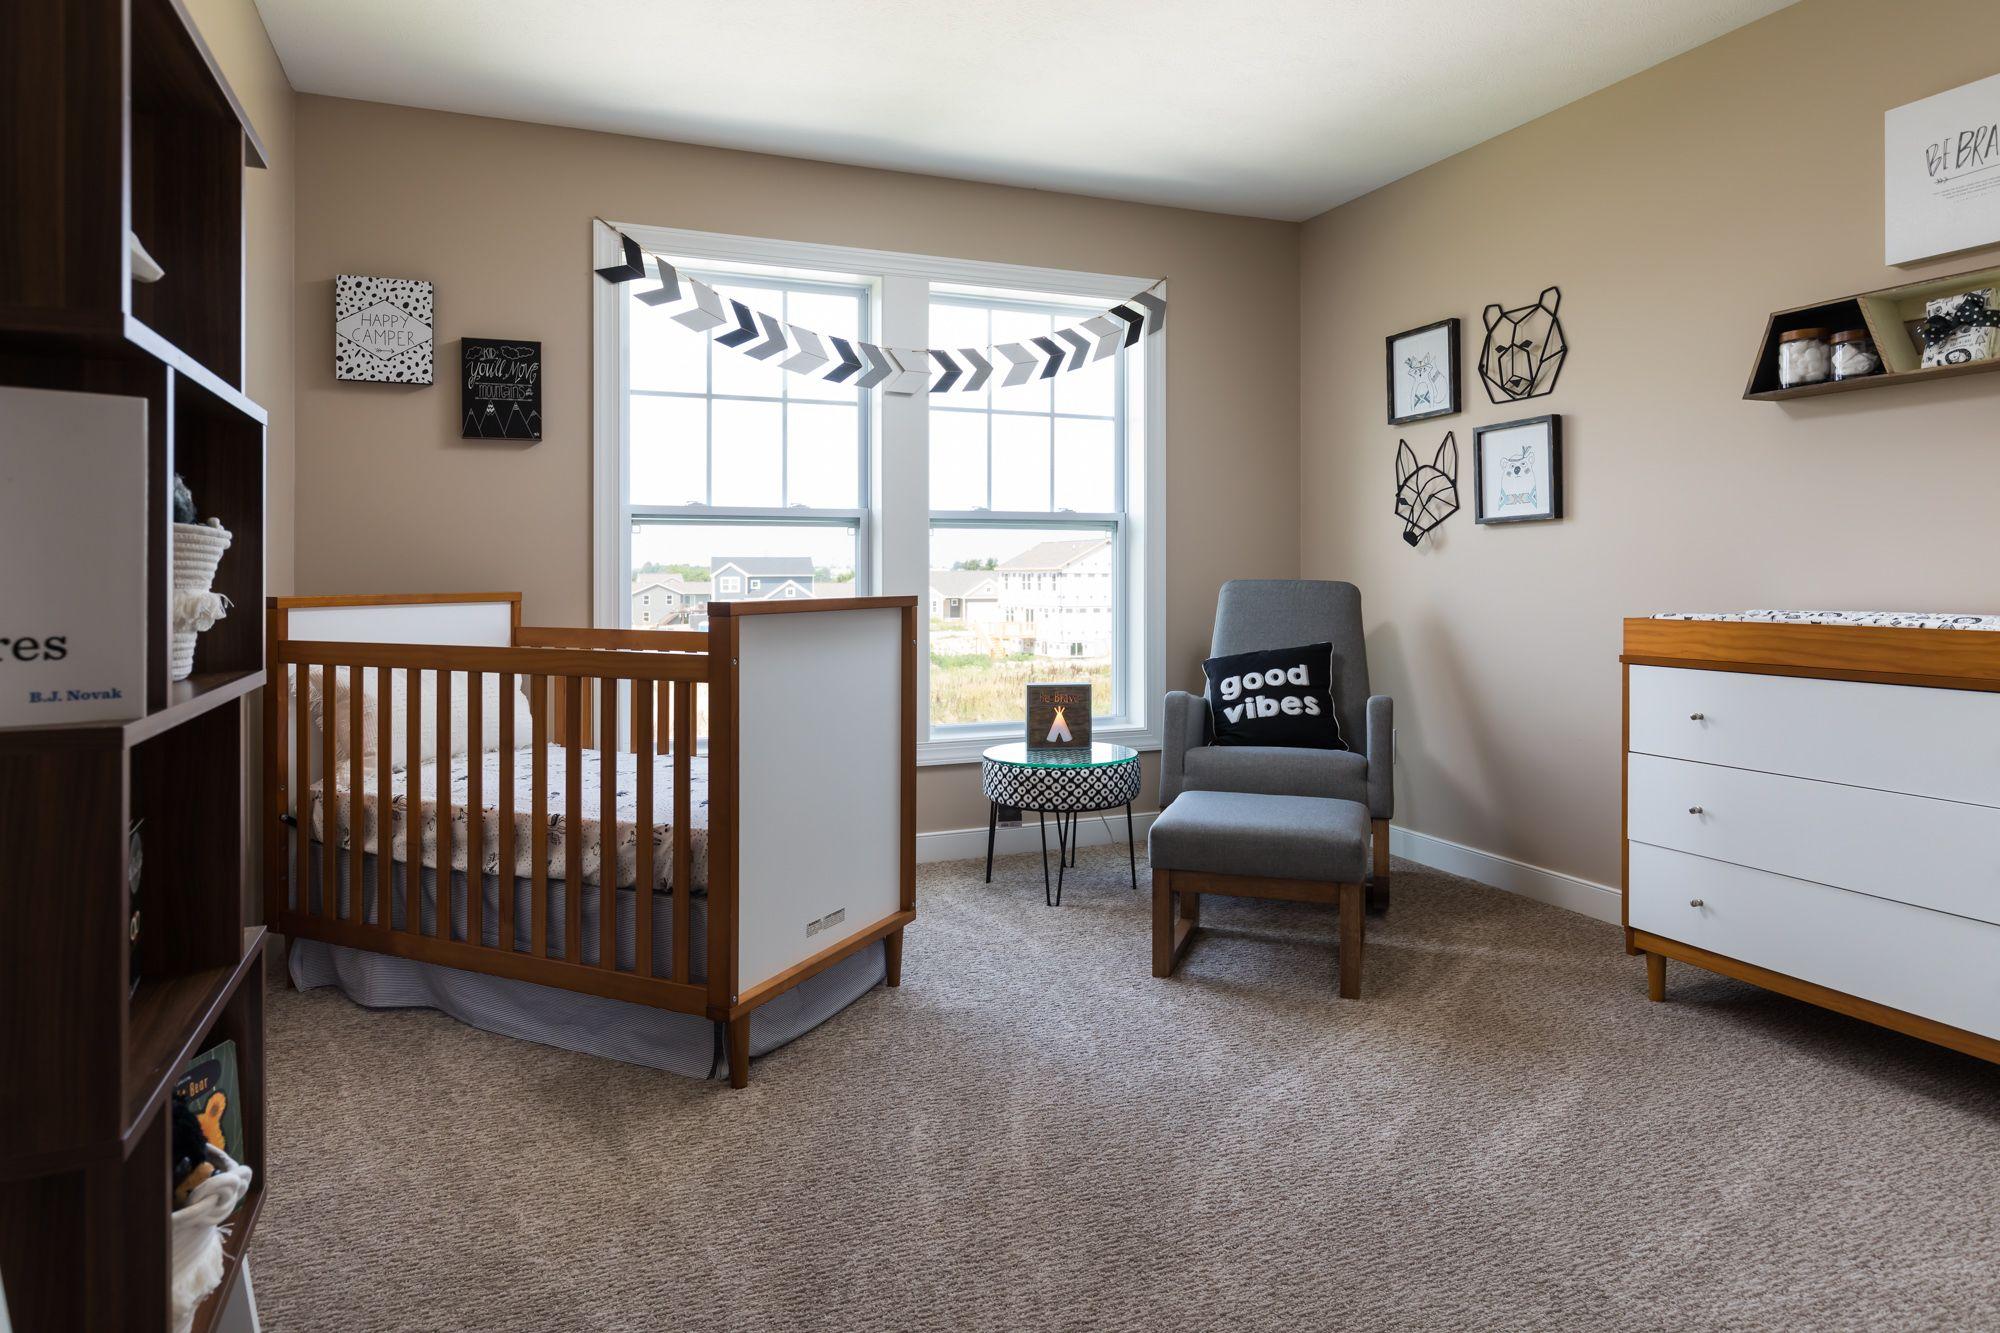 Bedroom featured in the Elements 2600 By Allen Edwin Homes in Grand Rapids, MI